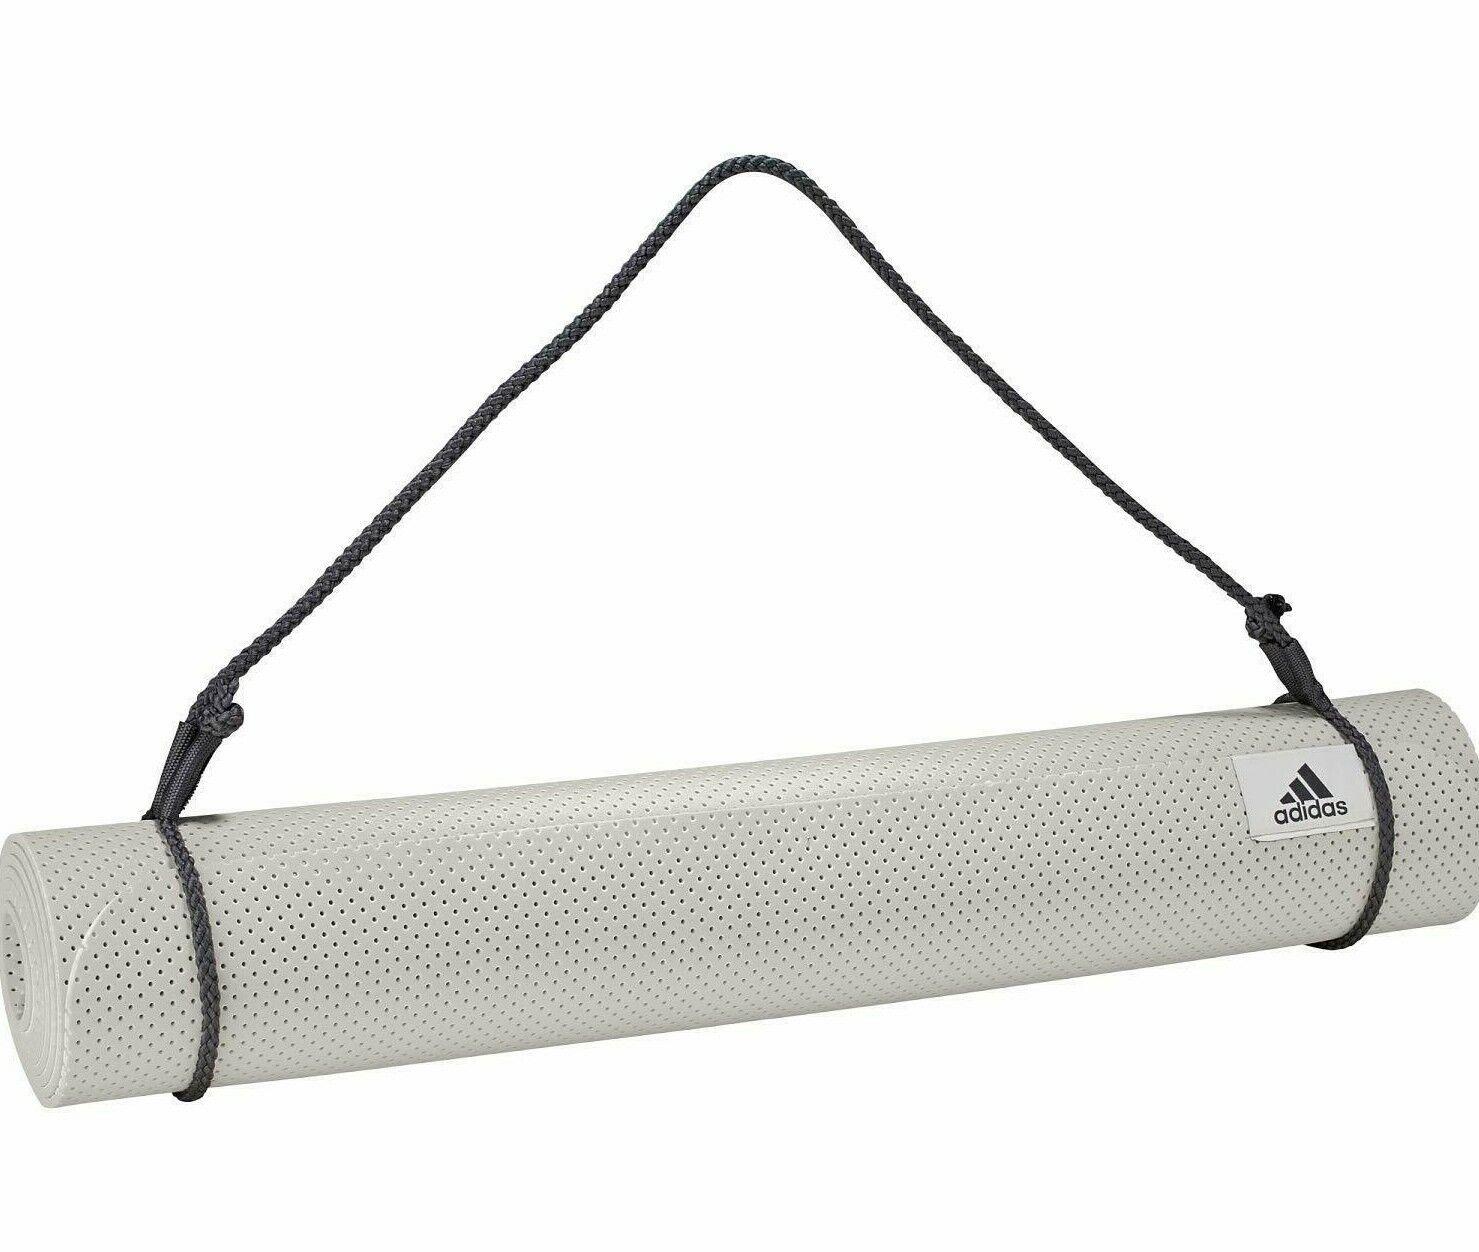 Adidas Yoga Mat Sports Gymnastic Training Workout Gym Fitnes